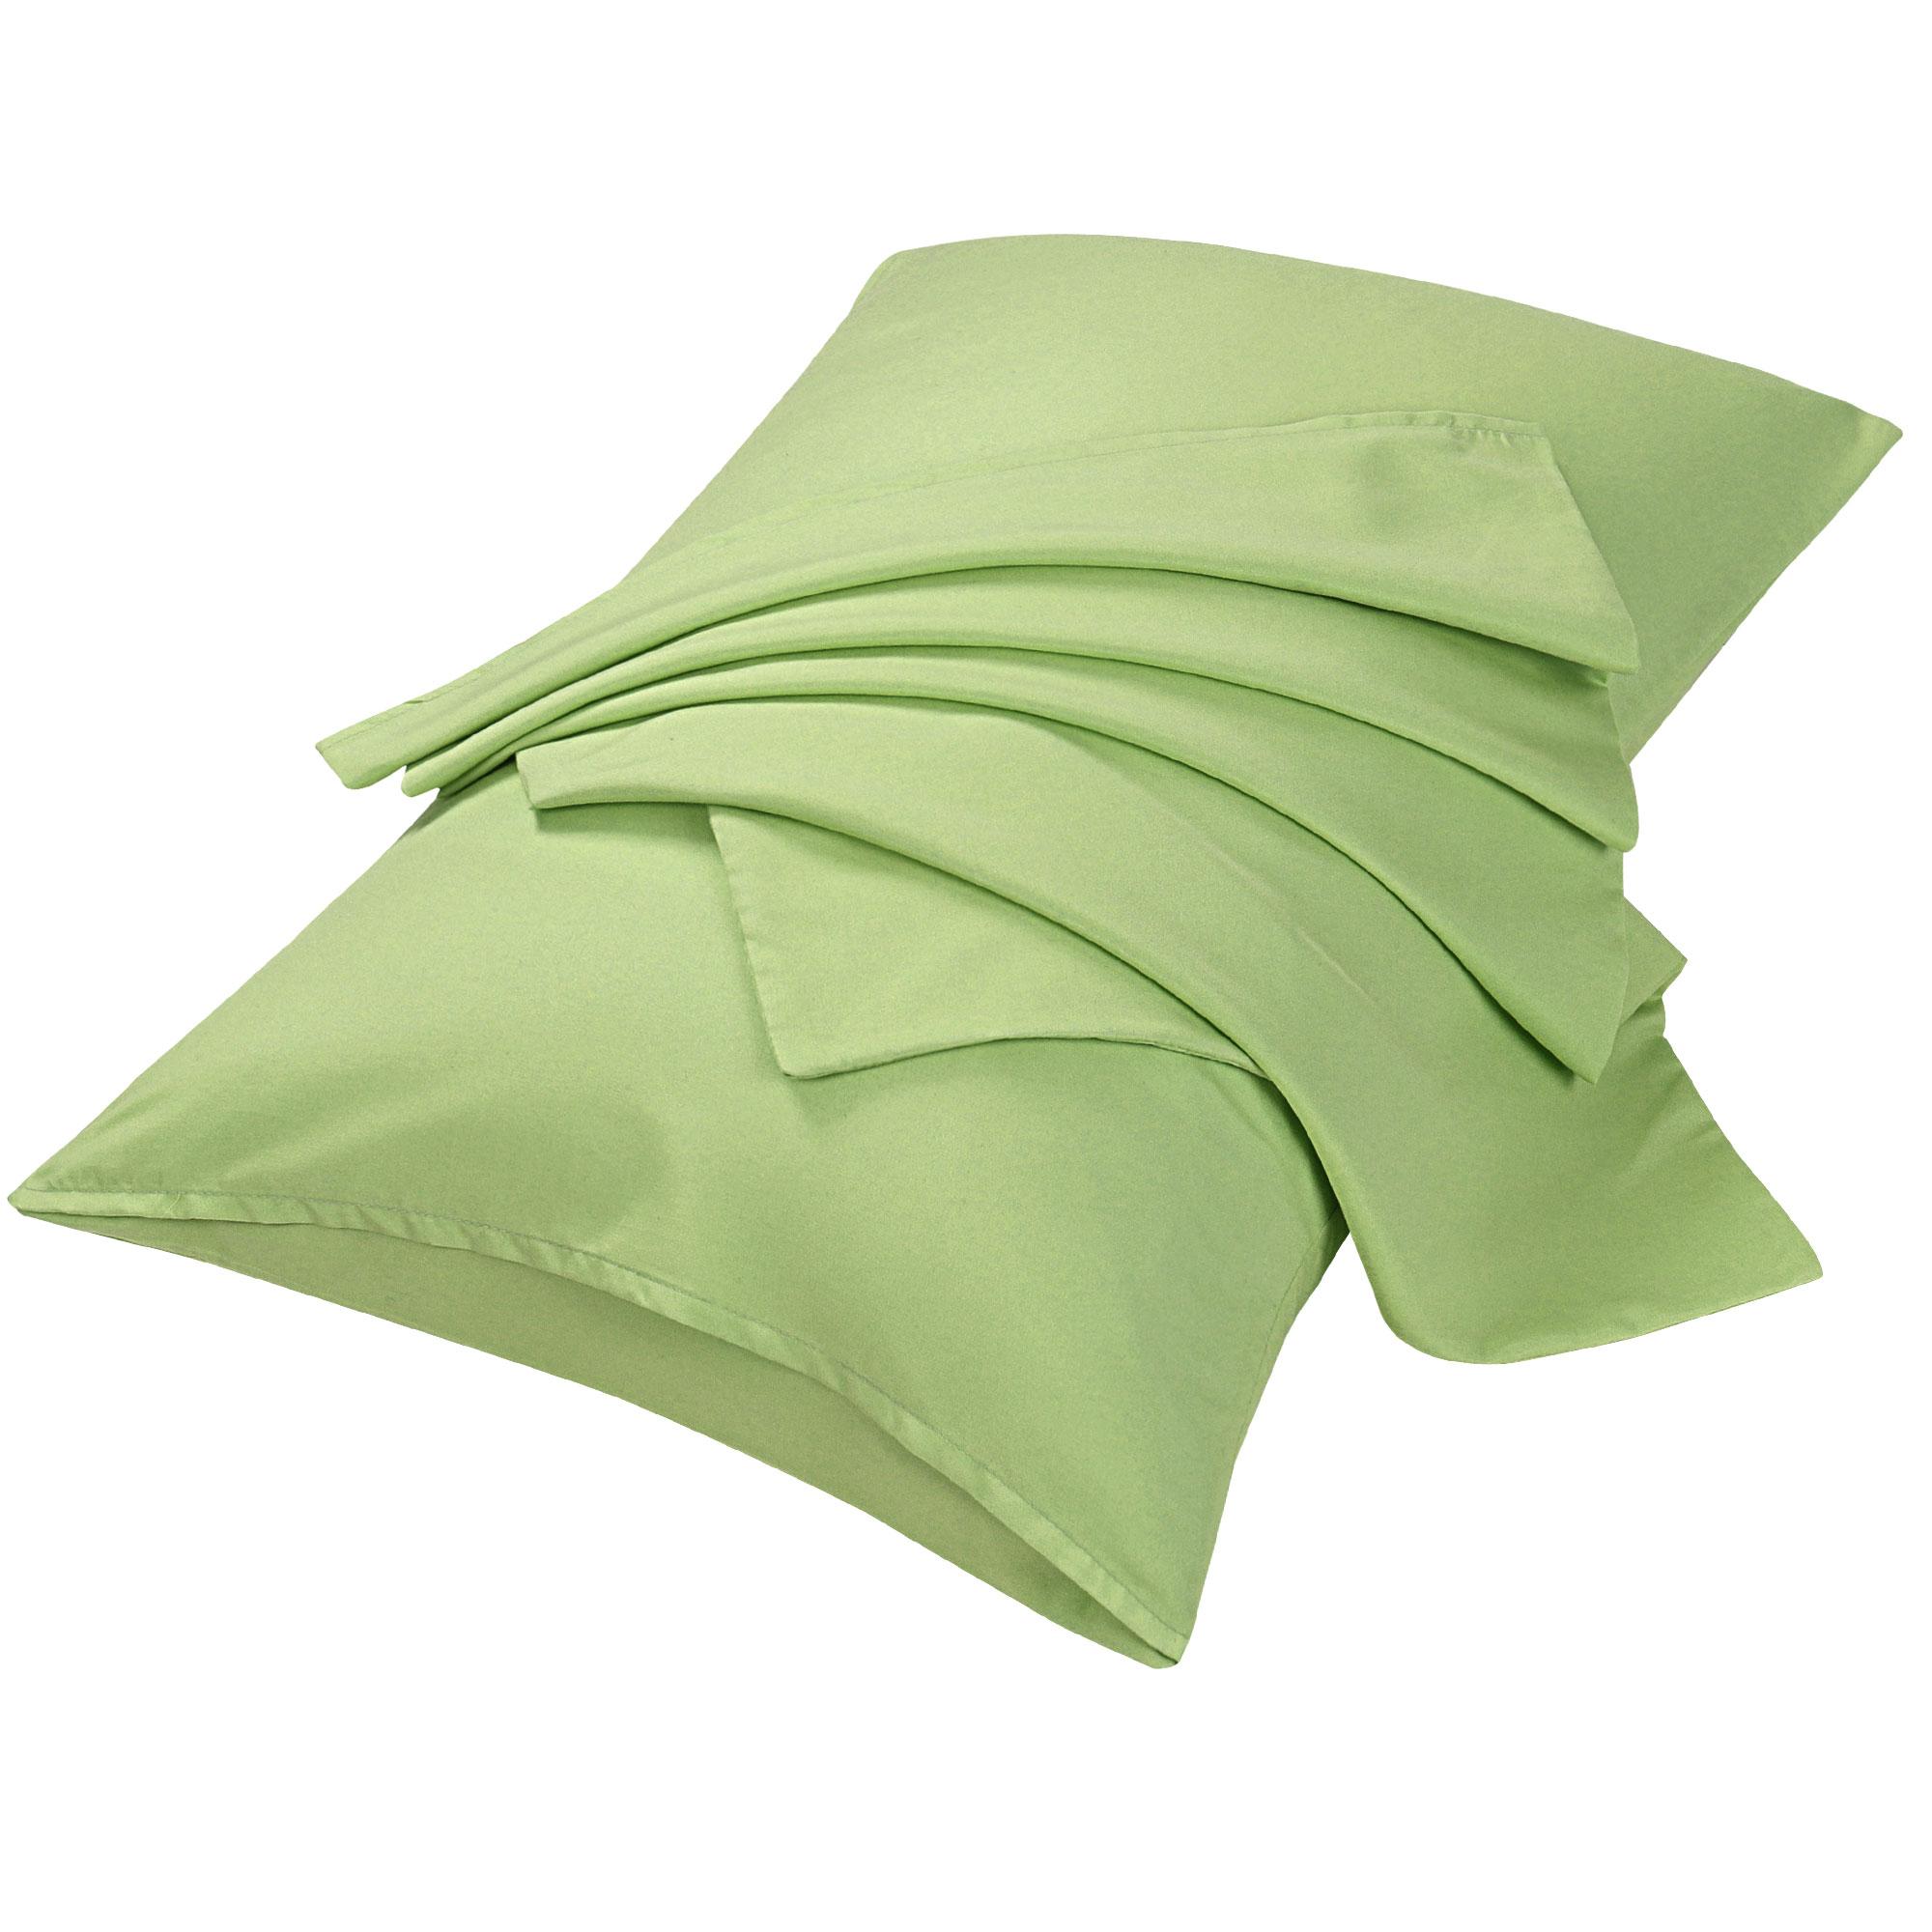 "2pcs Pillowcases Soft Microfiber, No Wrinkle, Sage Standard (20"" x 26"")"